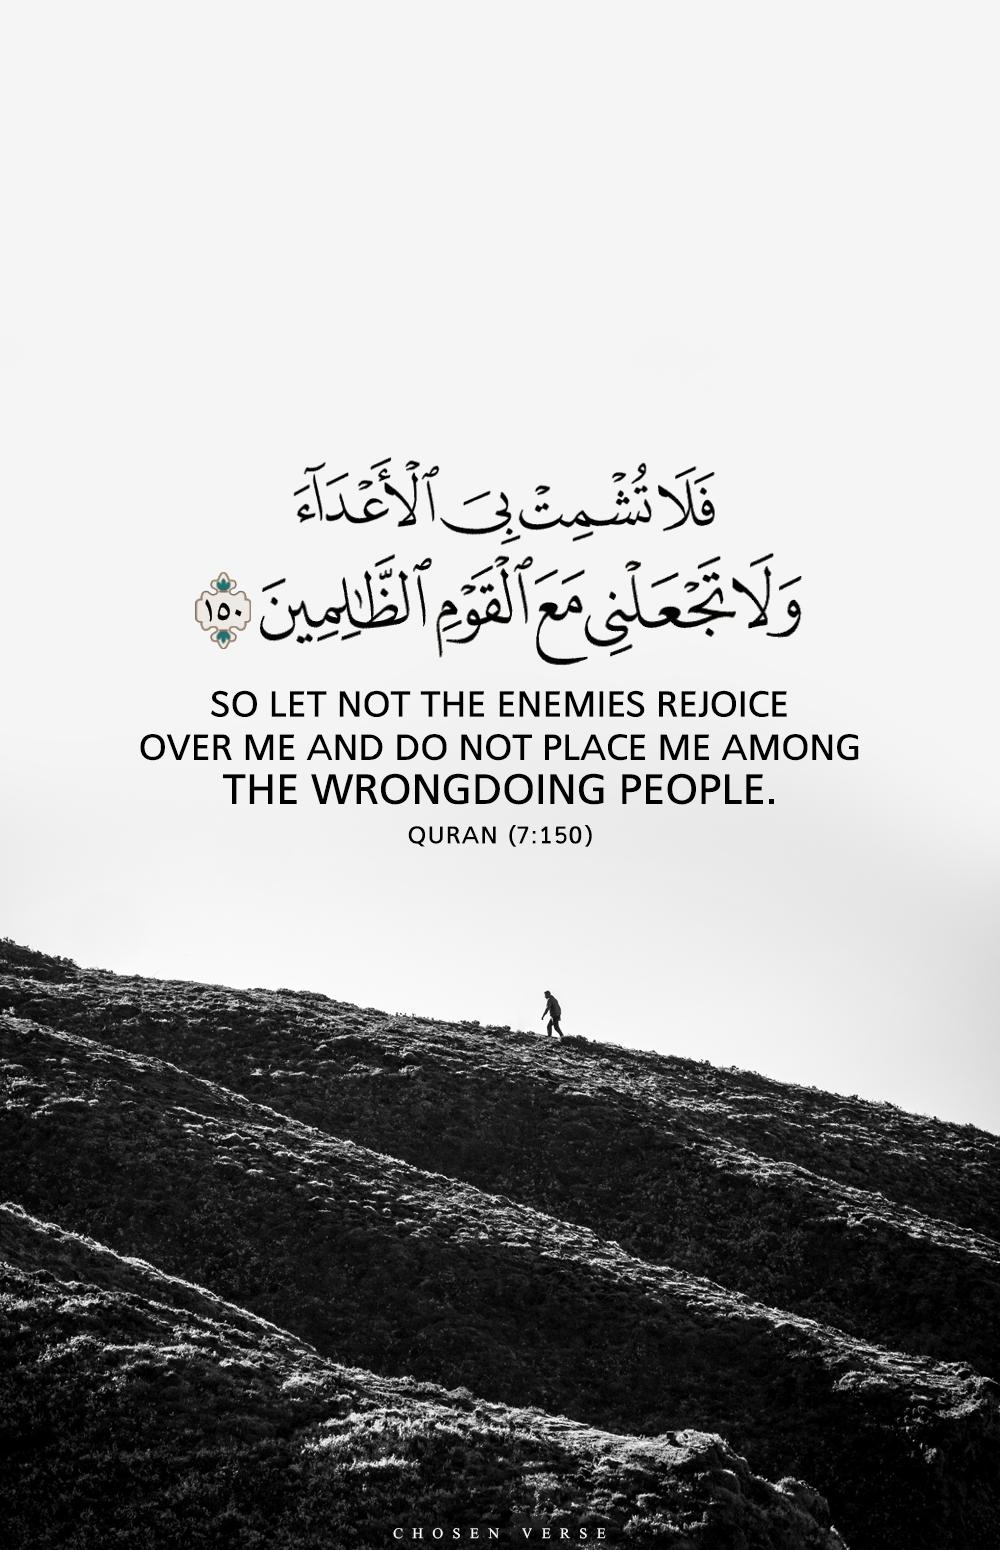 ف ل ا ت ش م ت ب ي ال أ ع د اء و ل ا ت ج ع ل ن ي م ع ال ق و م الظ ال م ين Quran Quotes Love Quran Quotes Quran Verses